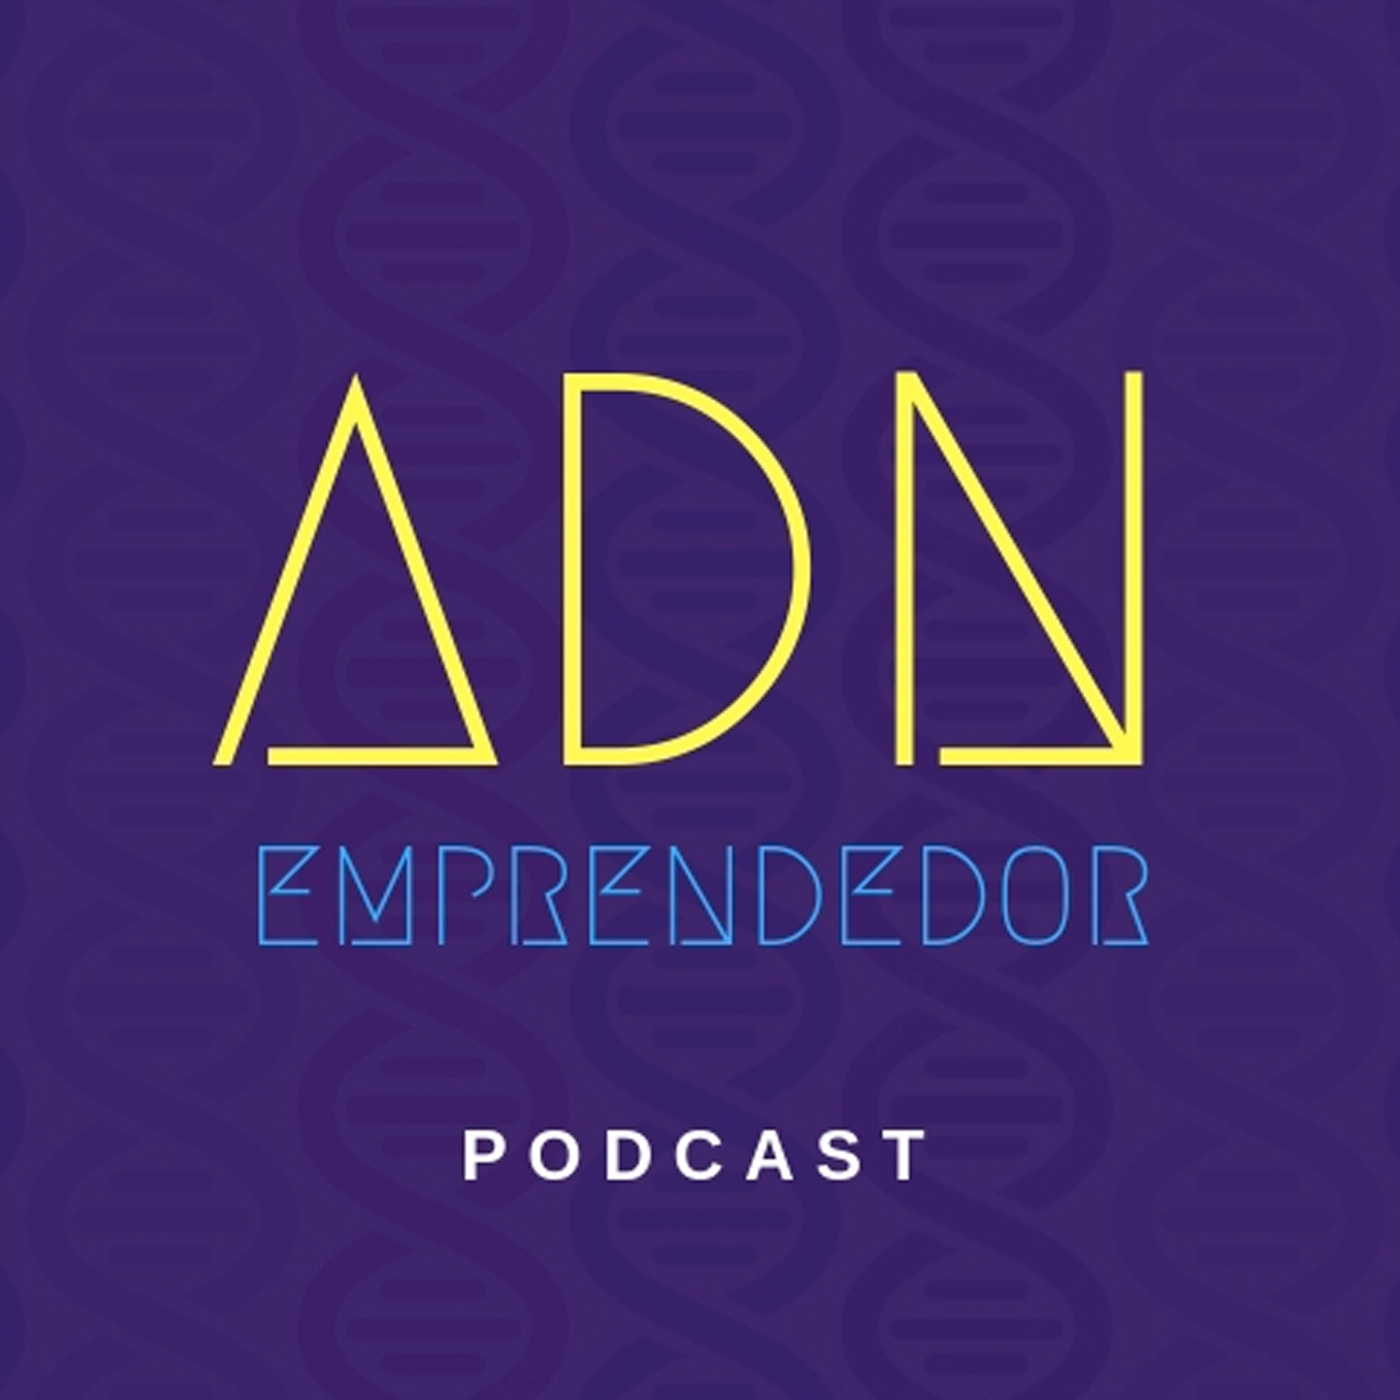 ADN Emprendedor